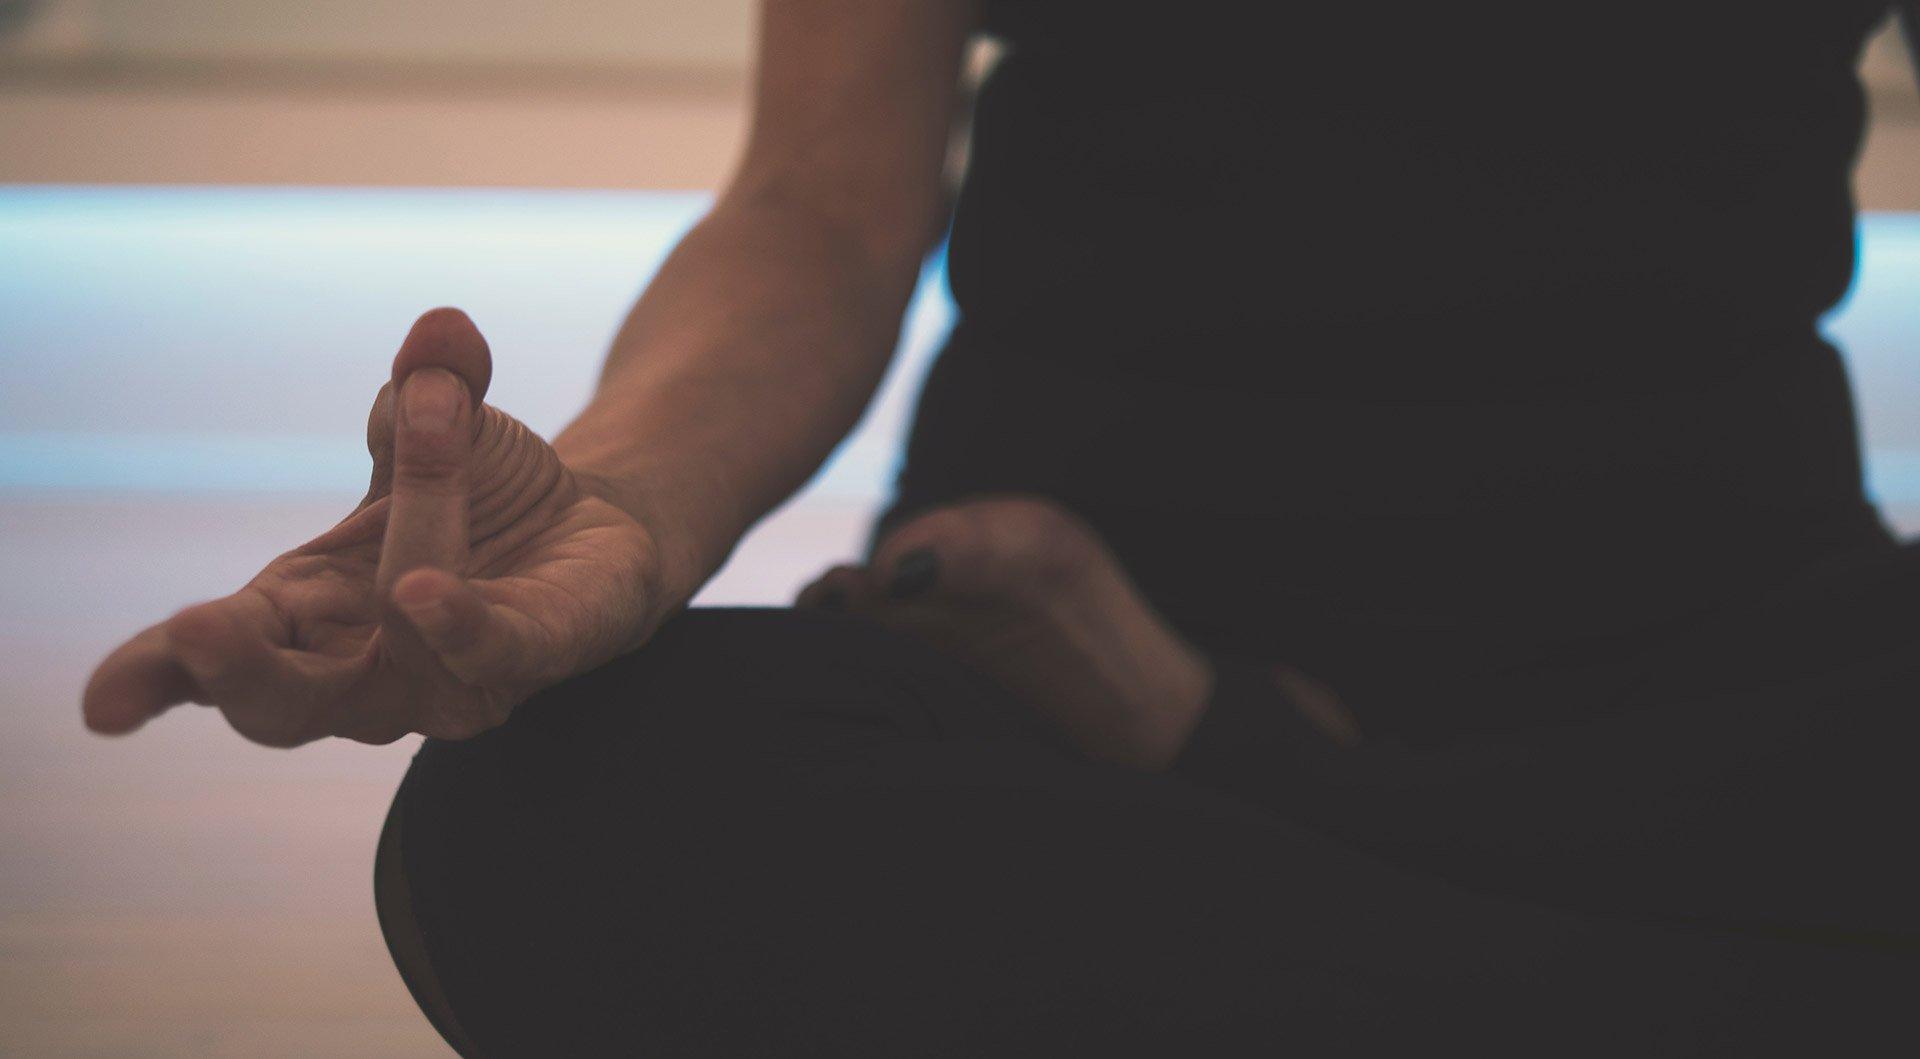 meditation-in-home-hero